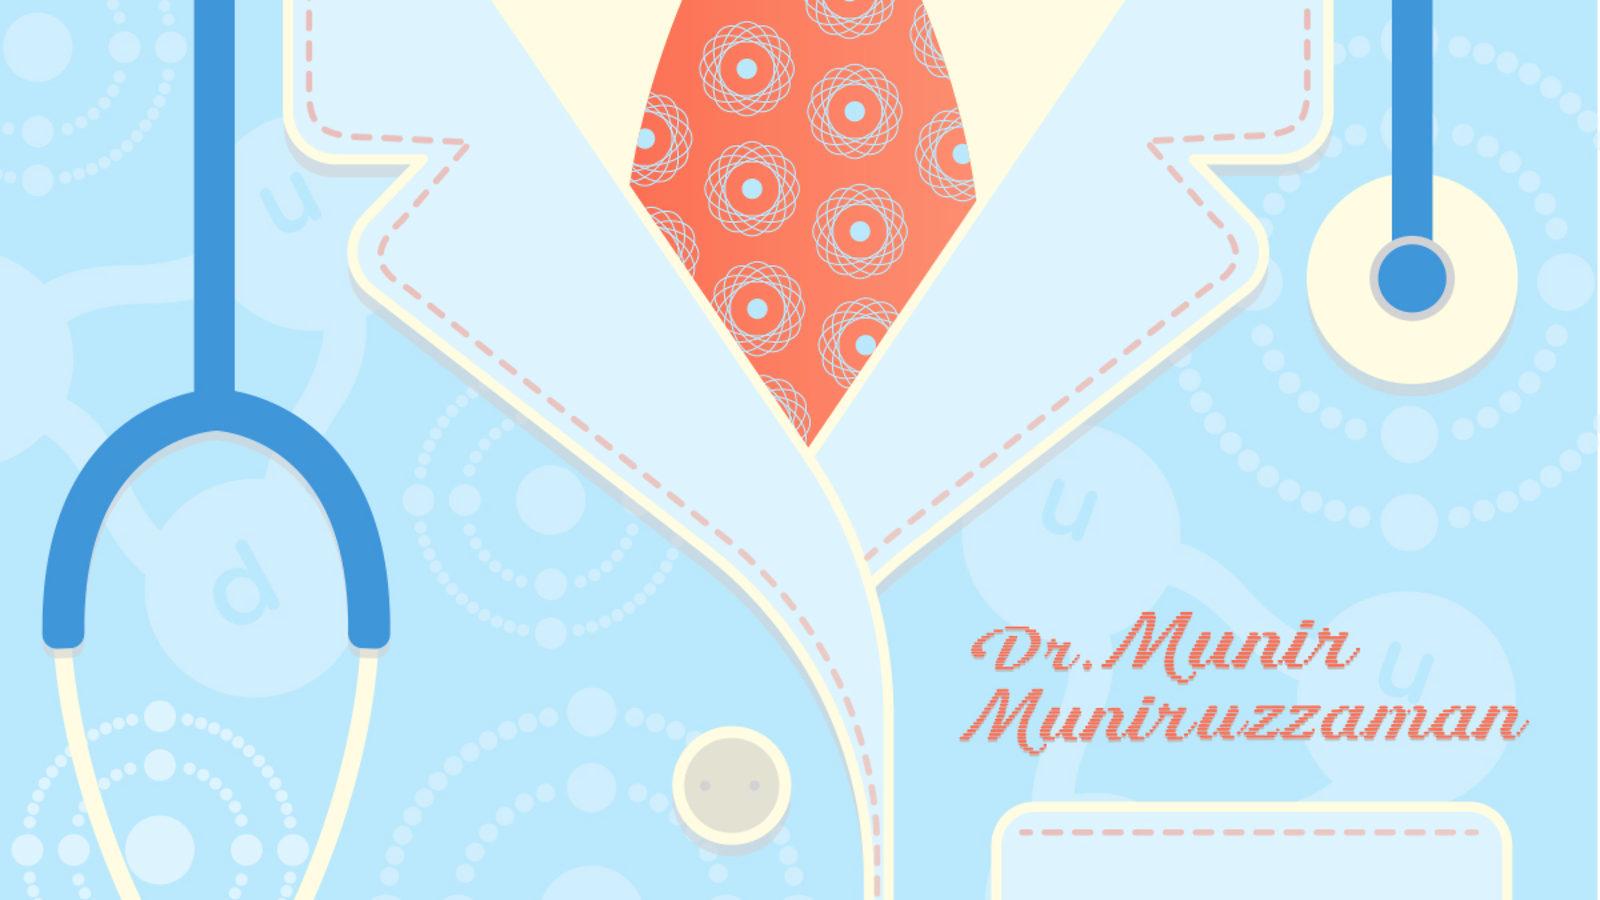 Illustration of Munir Muniruzzaman's chest in doctors coat, tie, and stethoscope